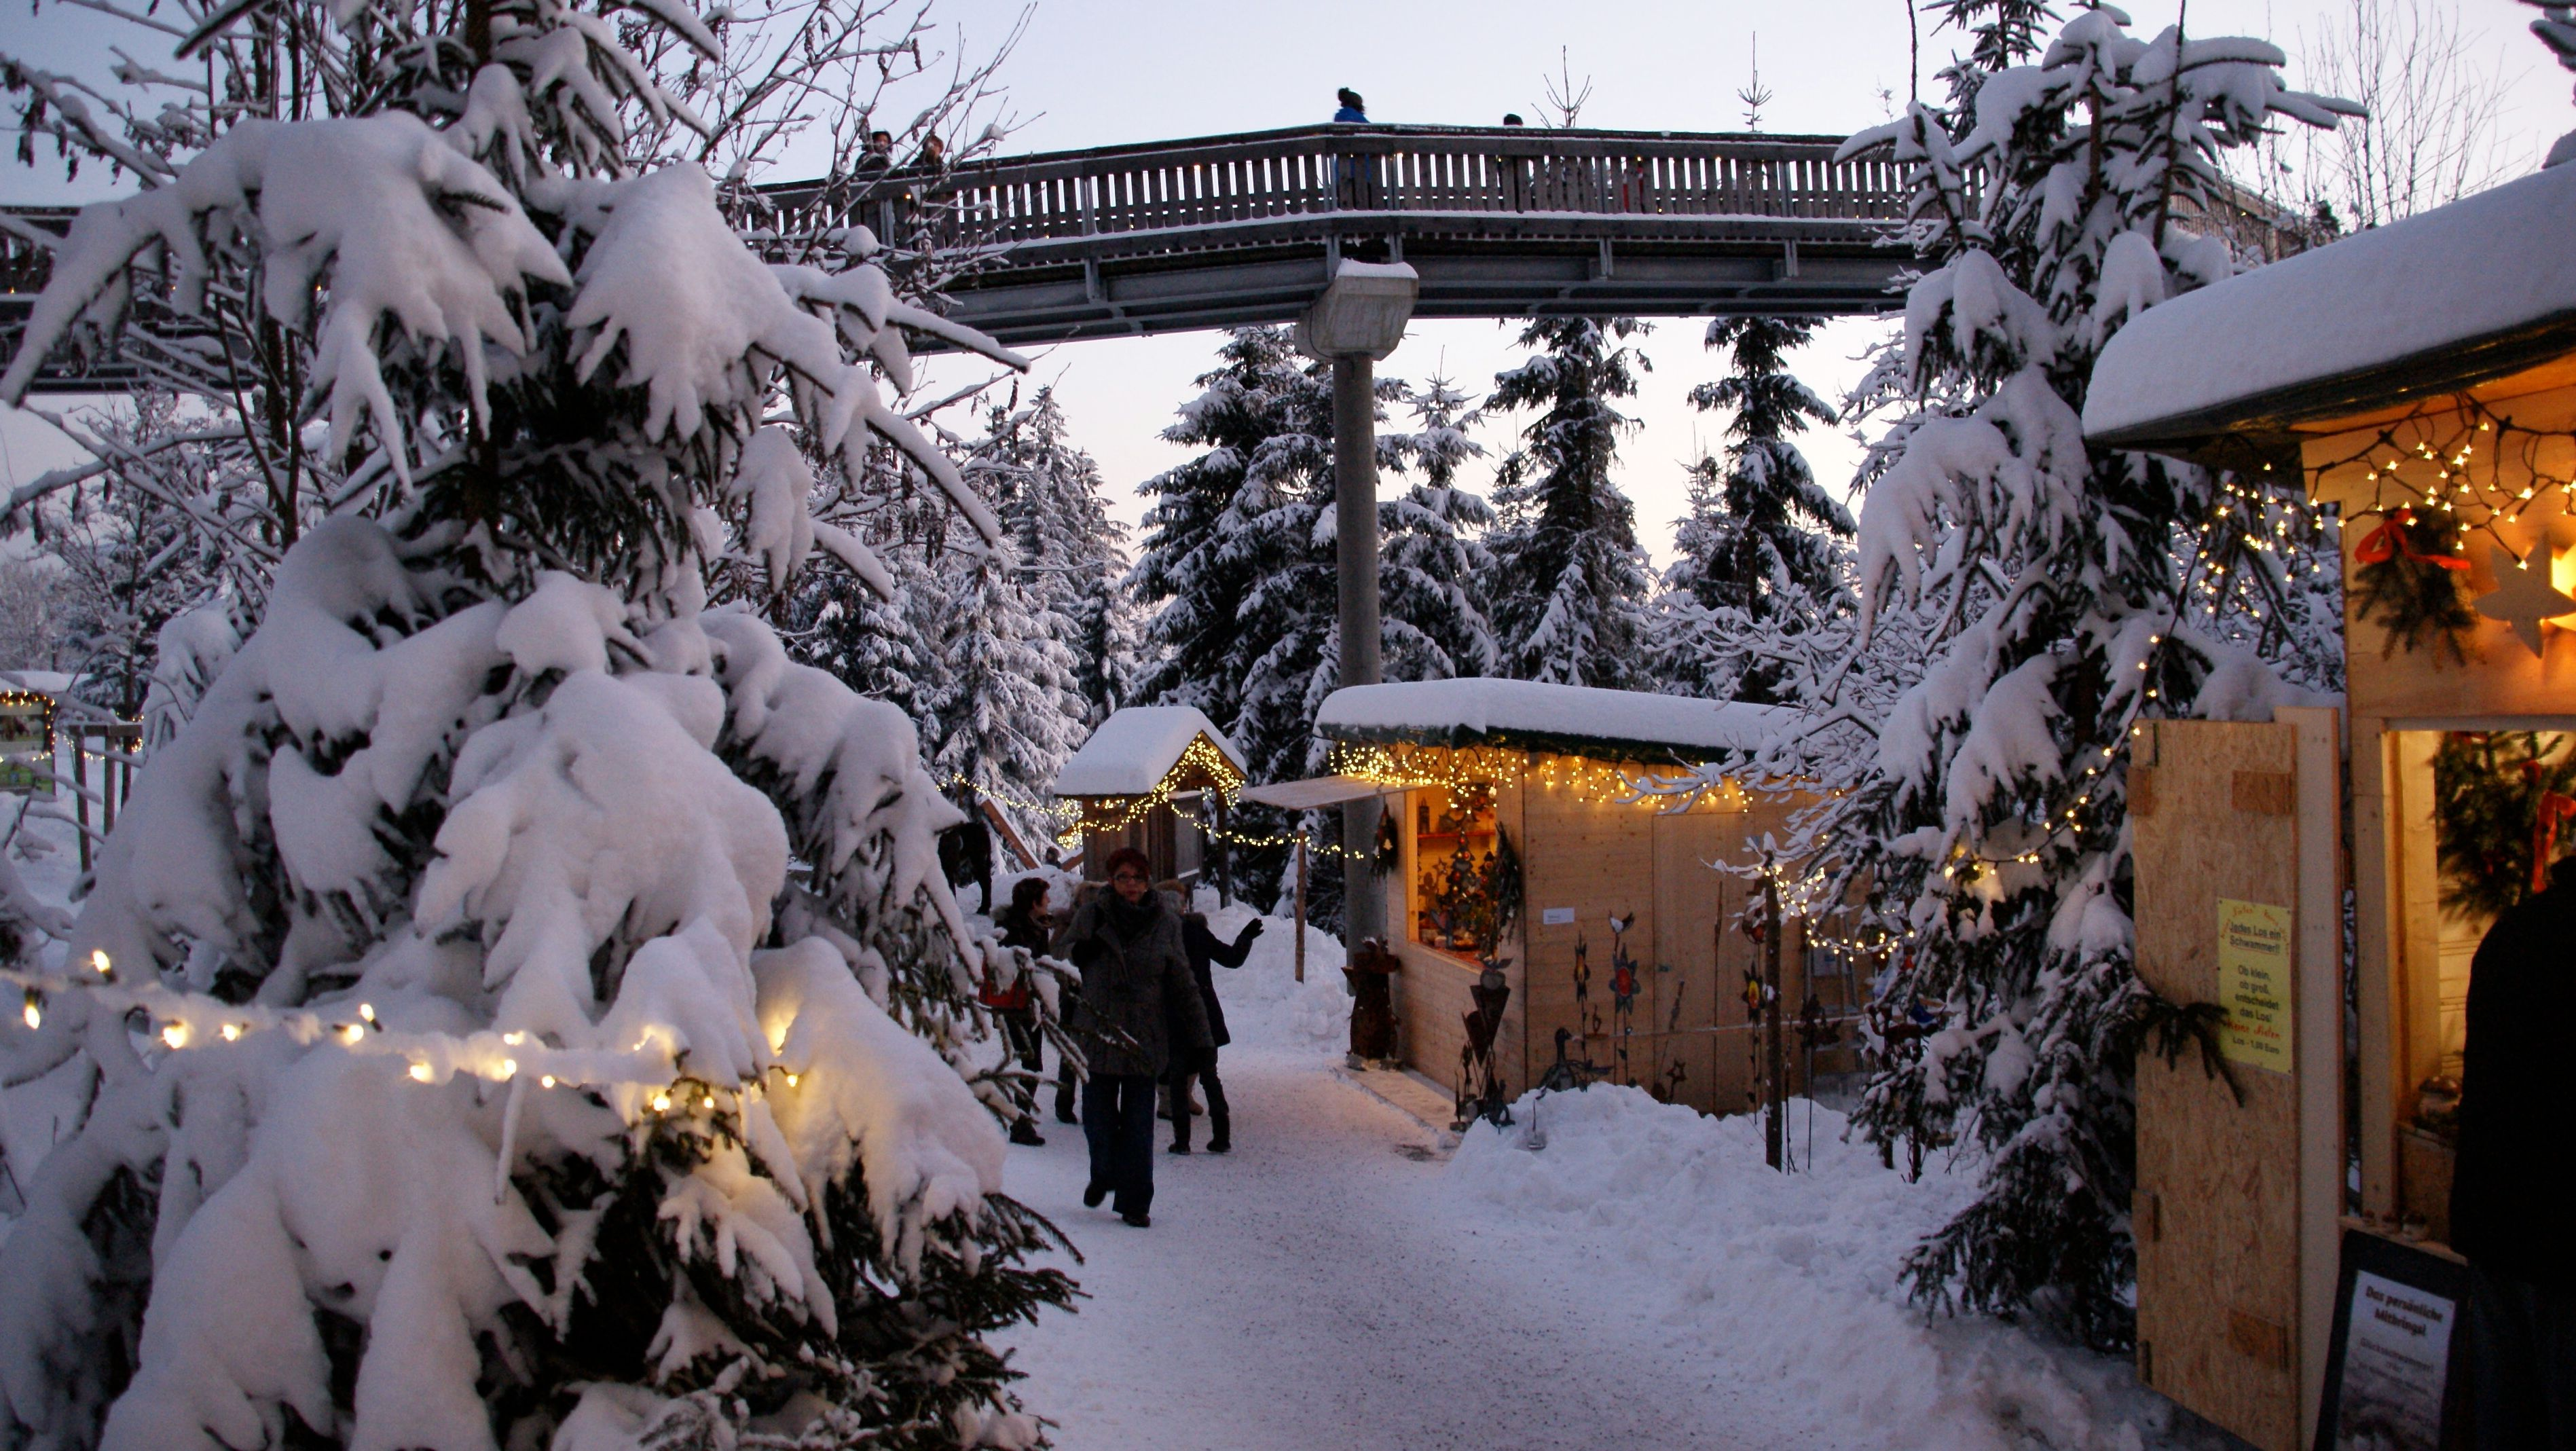 Bummel durch den schneebedeckten Waldwipfelweg zum Christkindlmarkt